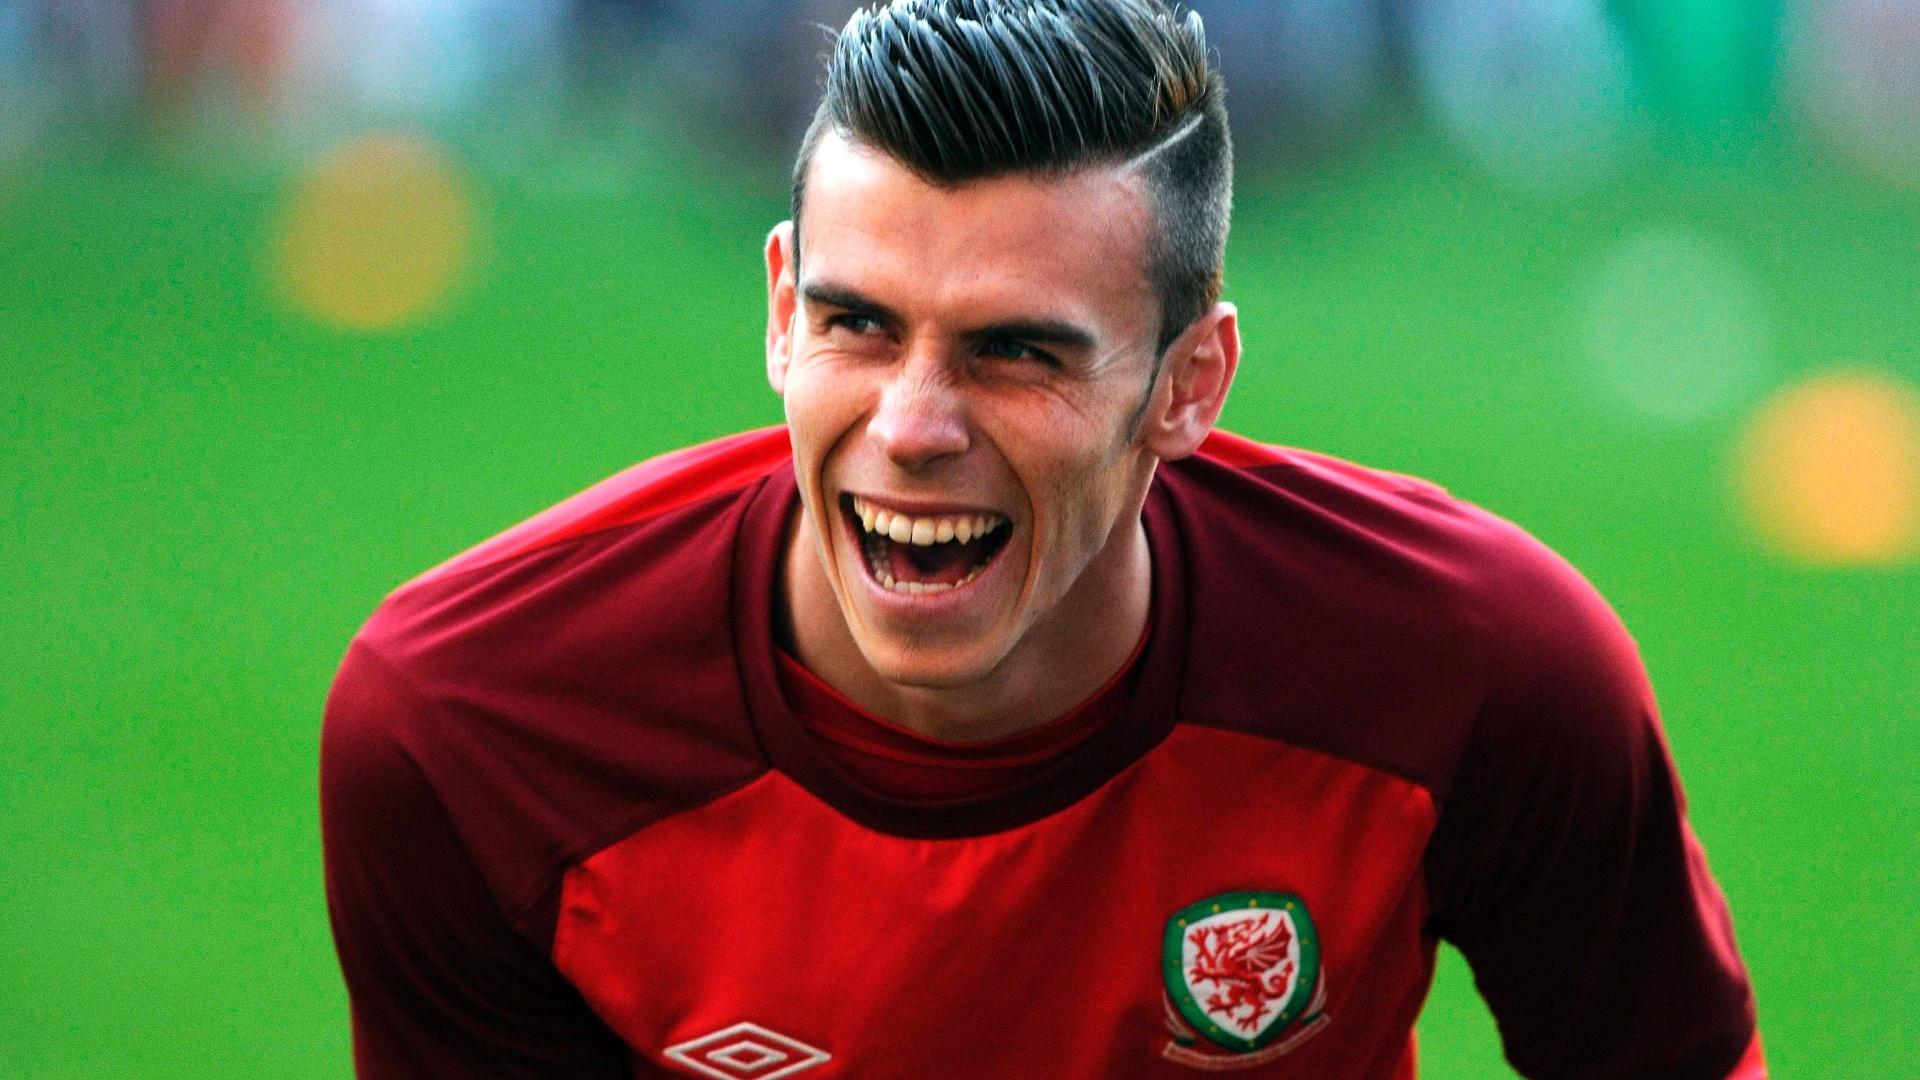 ... Gareth-Bale-Hairstyle-Image-10 ...